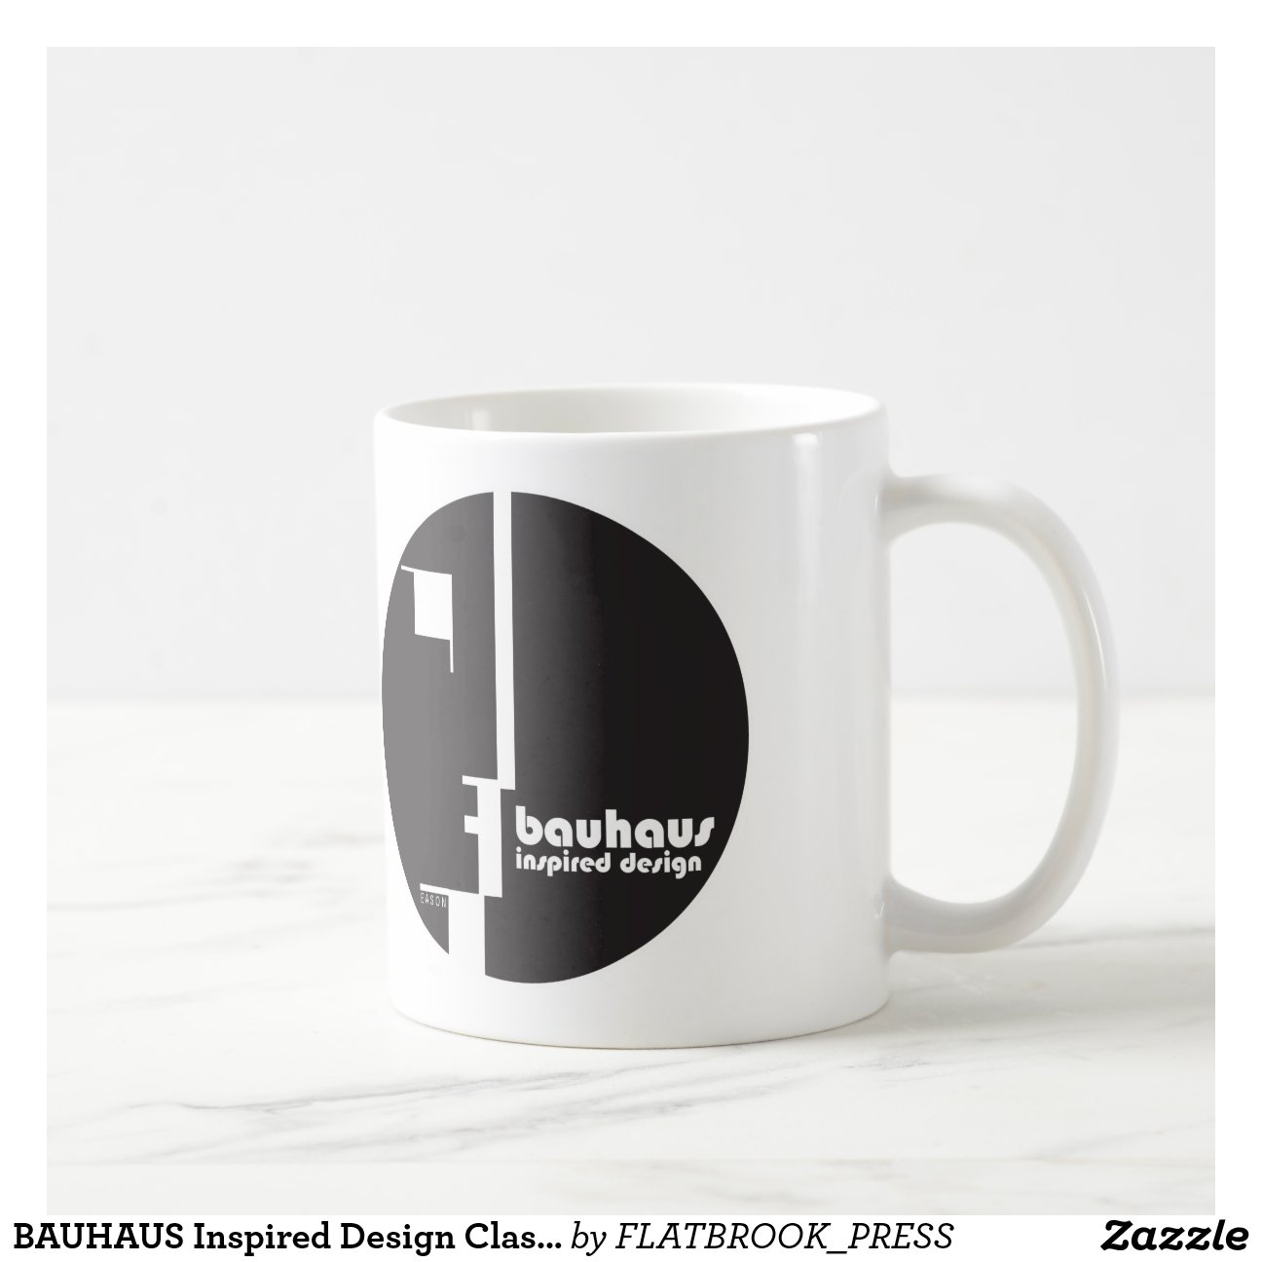 bauhaus inspirierte entwurfs klassische kreis ikon tasse zazzle. Black Bedroom Furniture Sets. Home Design Ideas